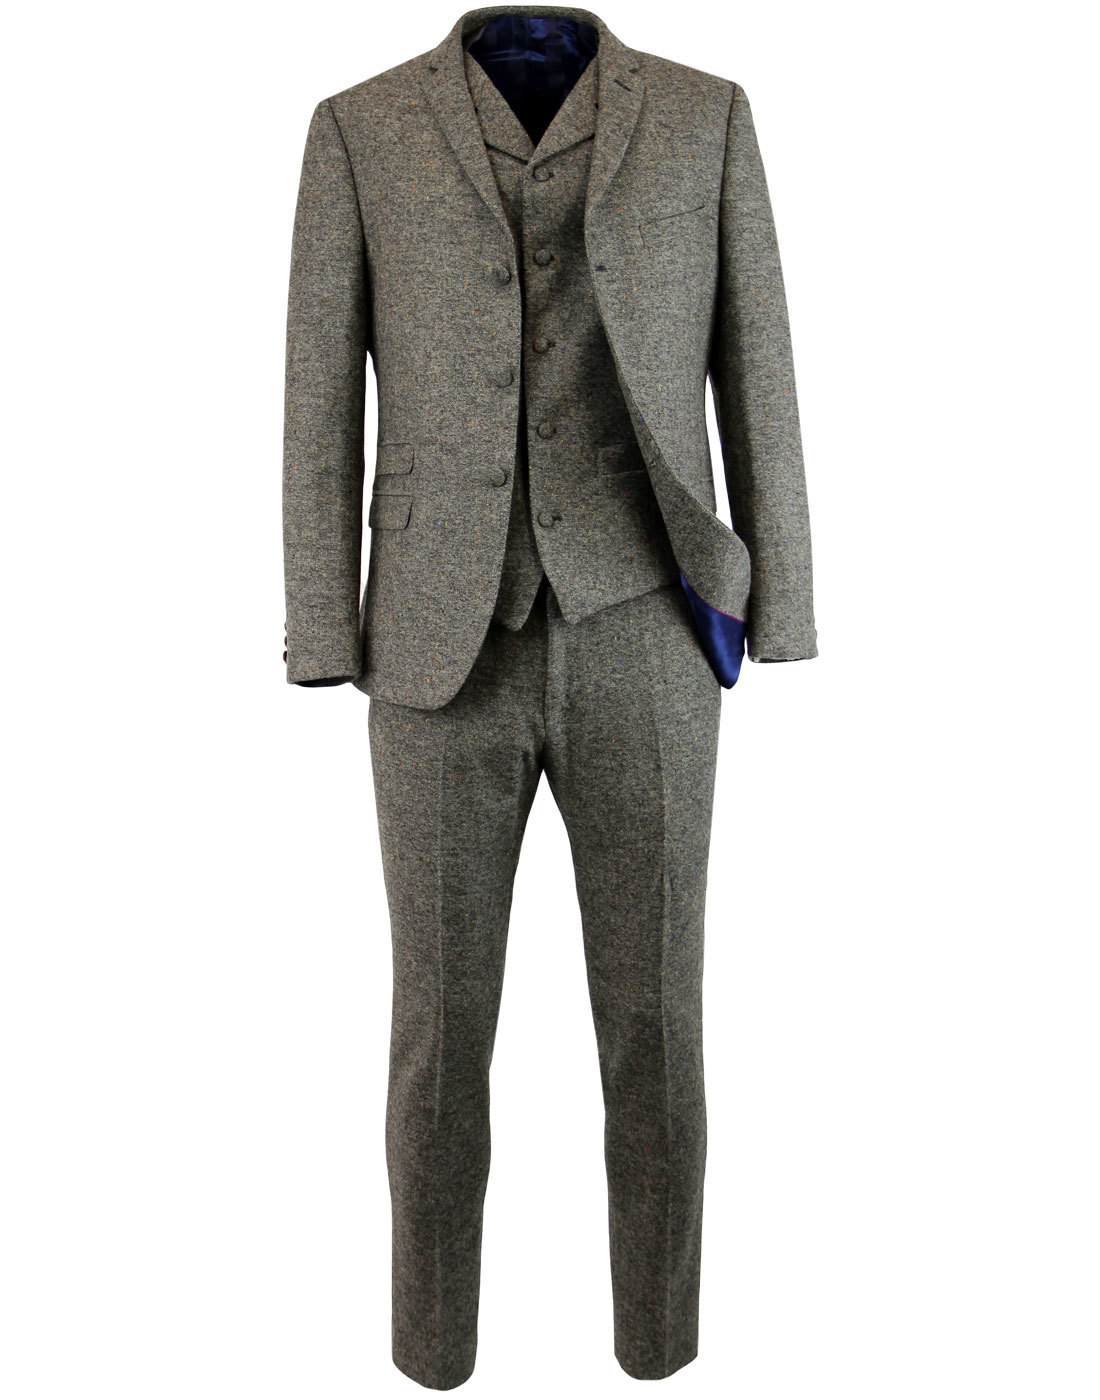 MADCAP ENGLAND Retro Mod 2 or 3 Piece Donegal Suit